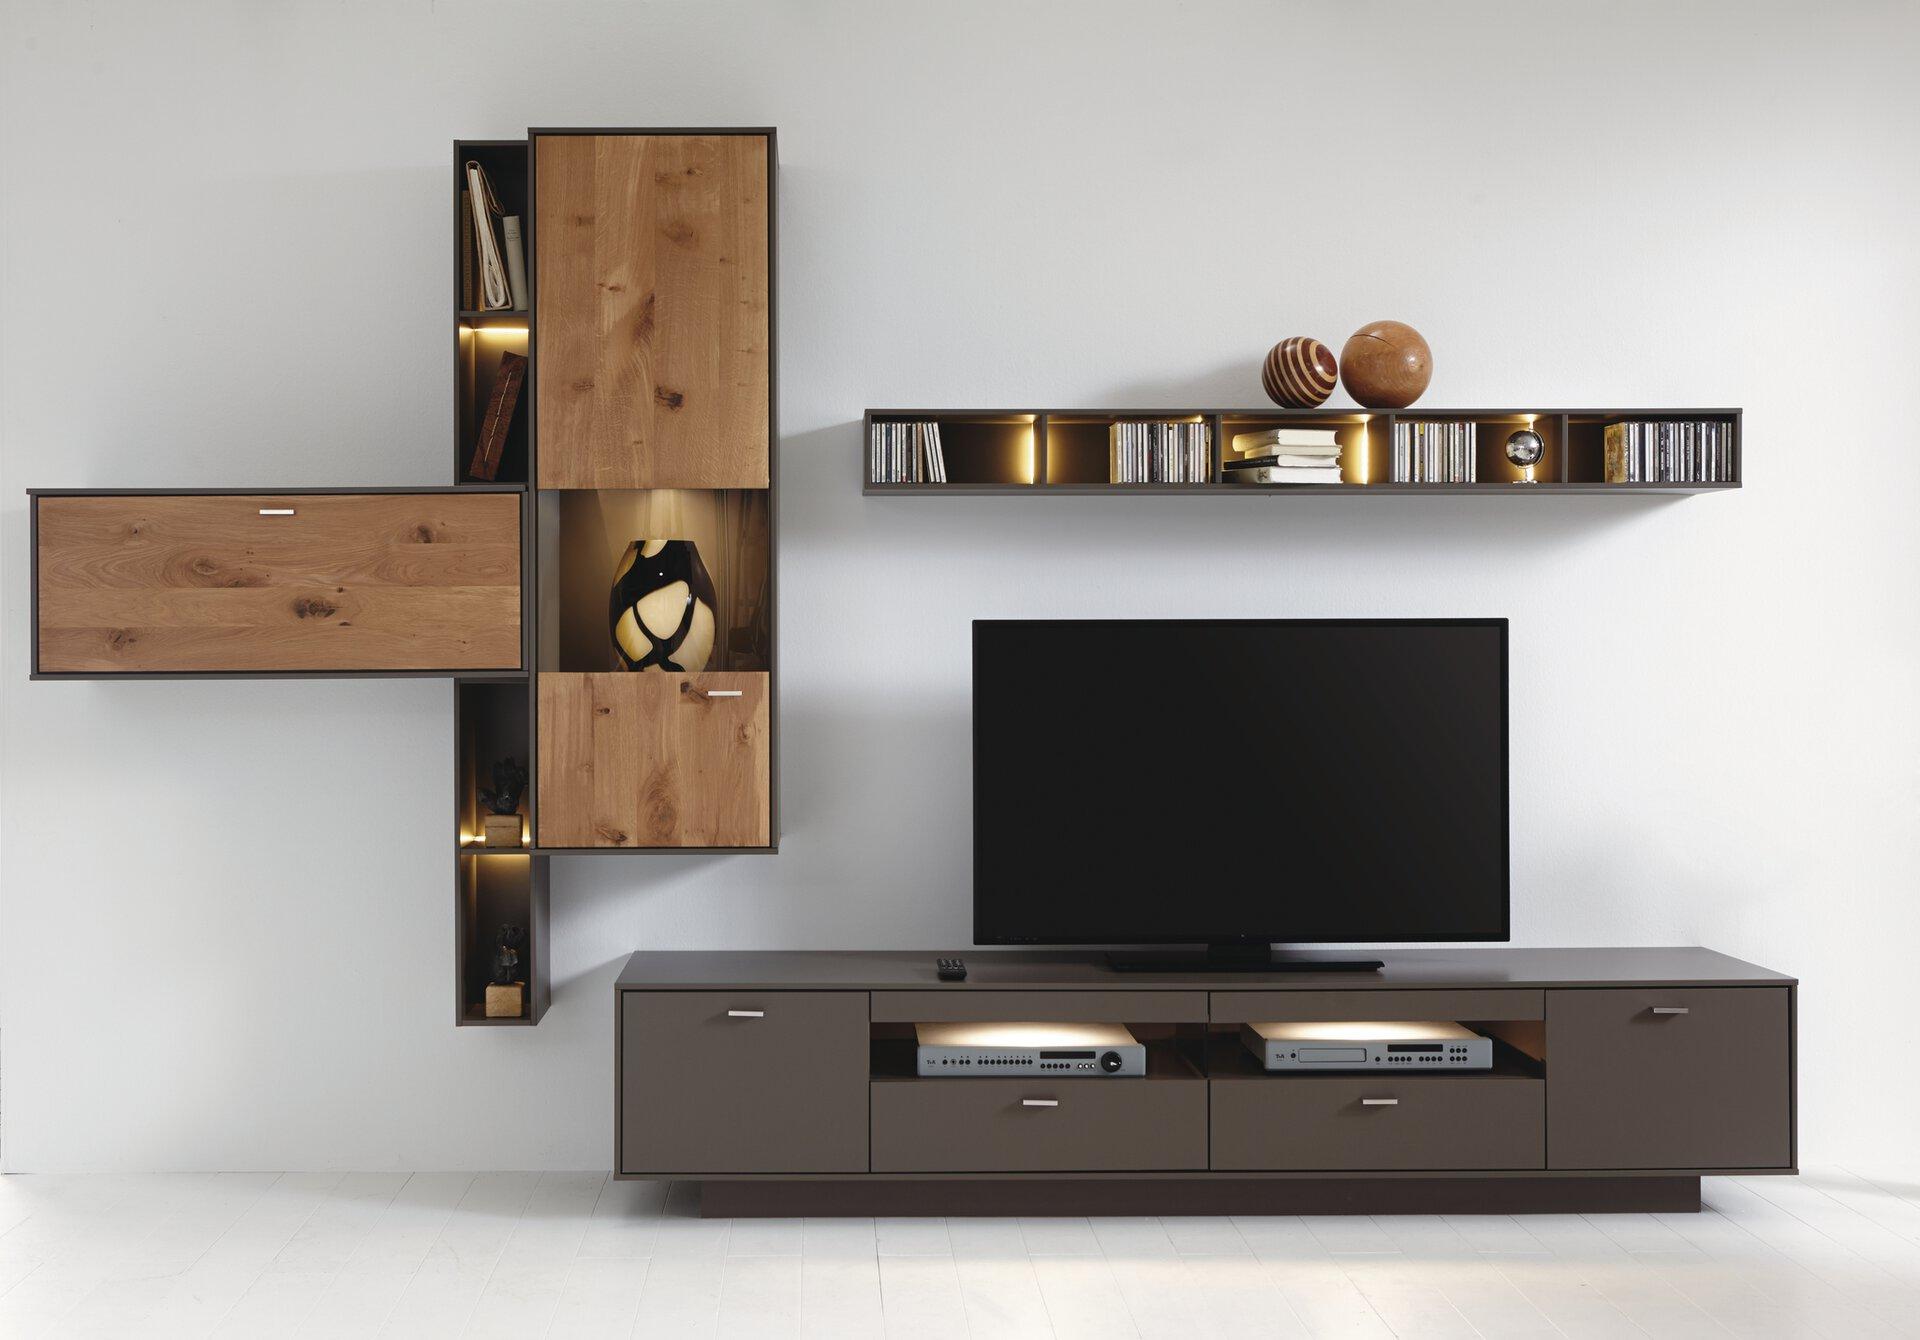 Wohnwand CAVA MONDO Holzwerkstoff braun 56 x 214 x 343 cm